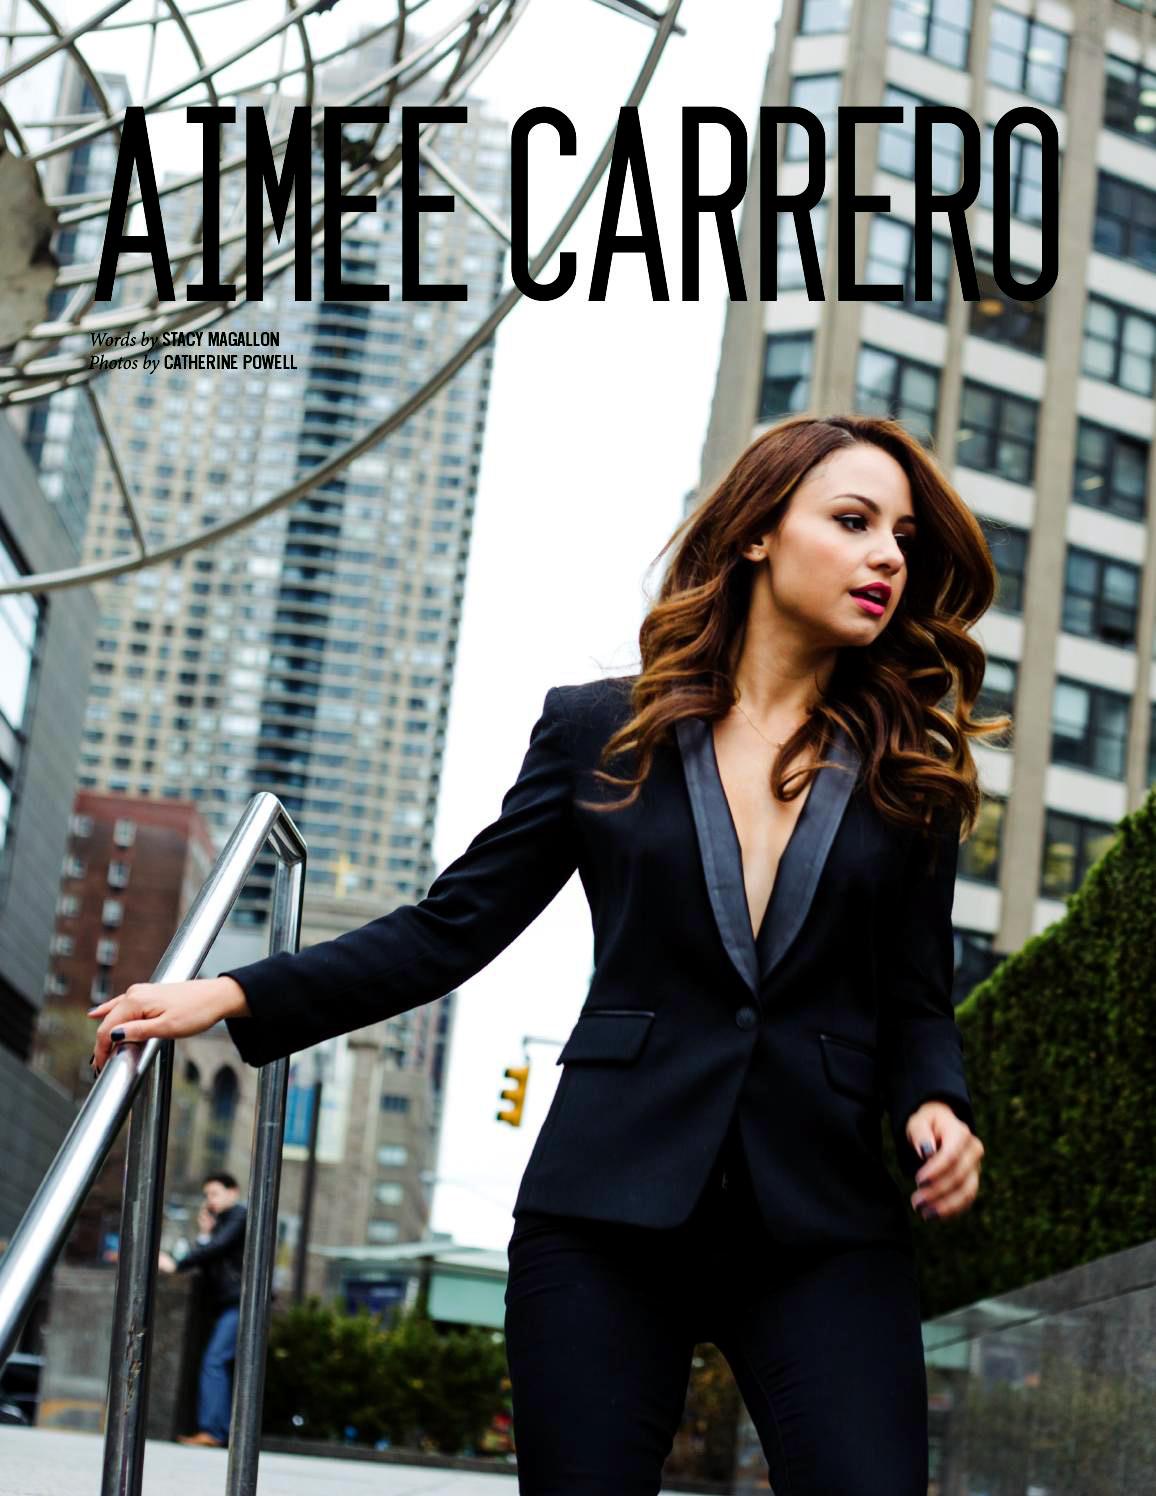 Aimee Carrero NKD Magazine Cover